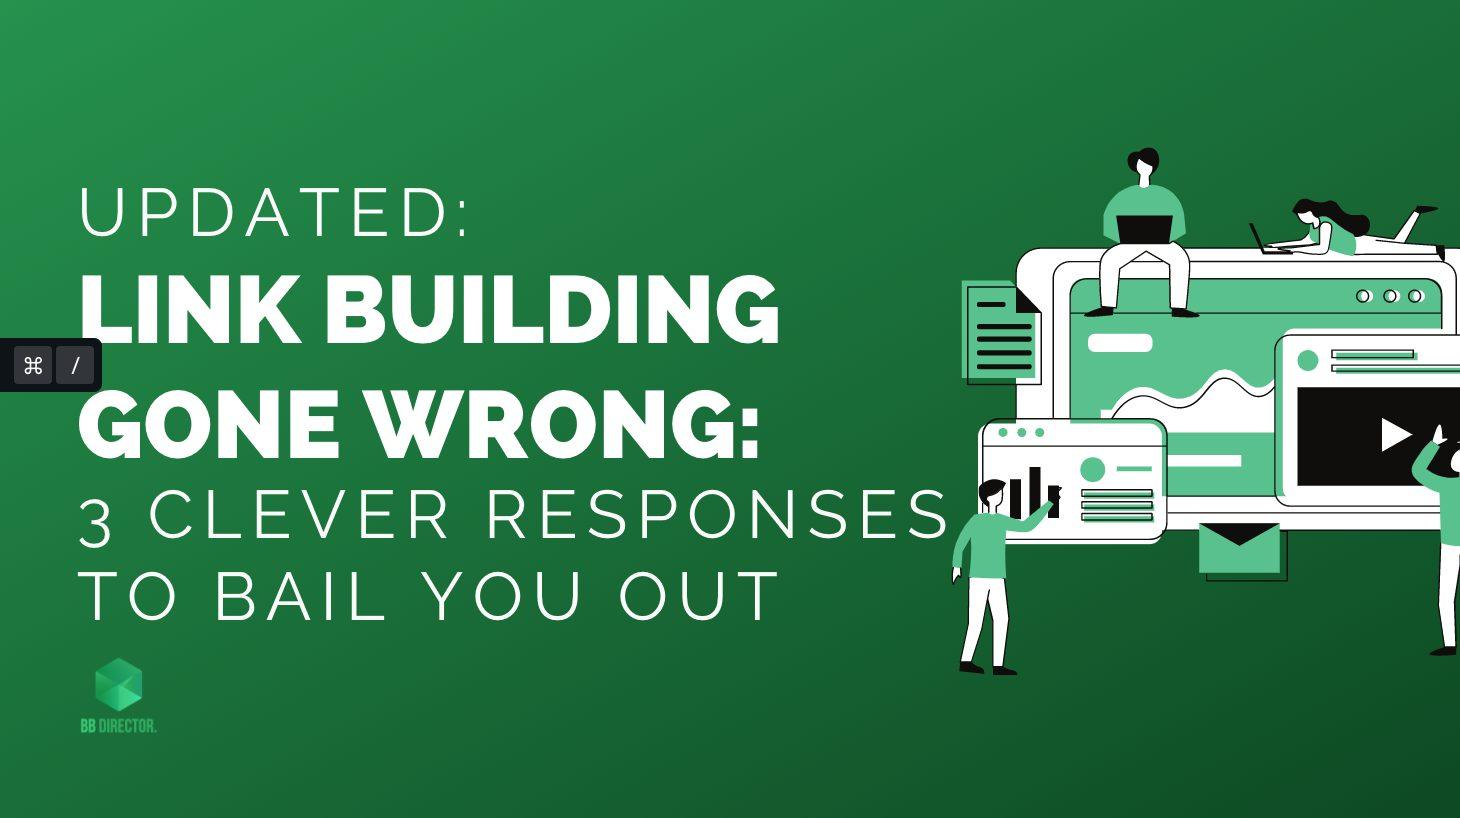 link building responses